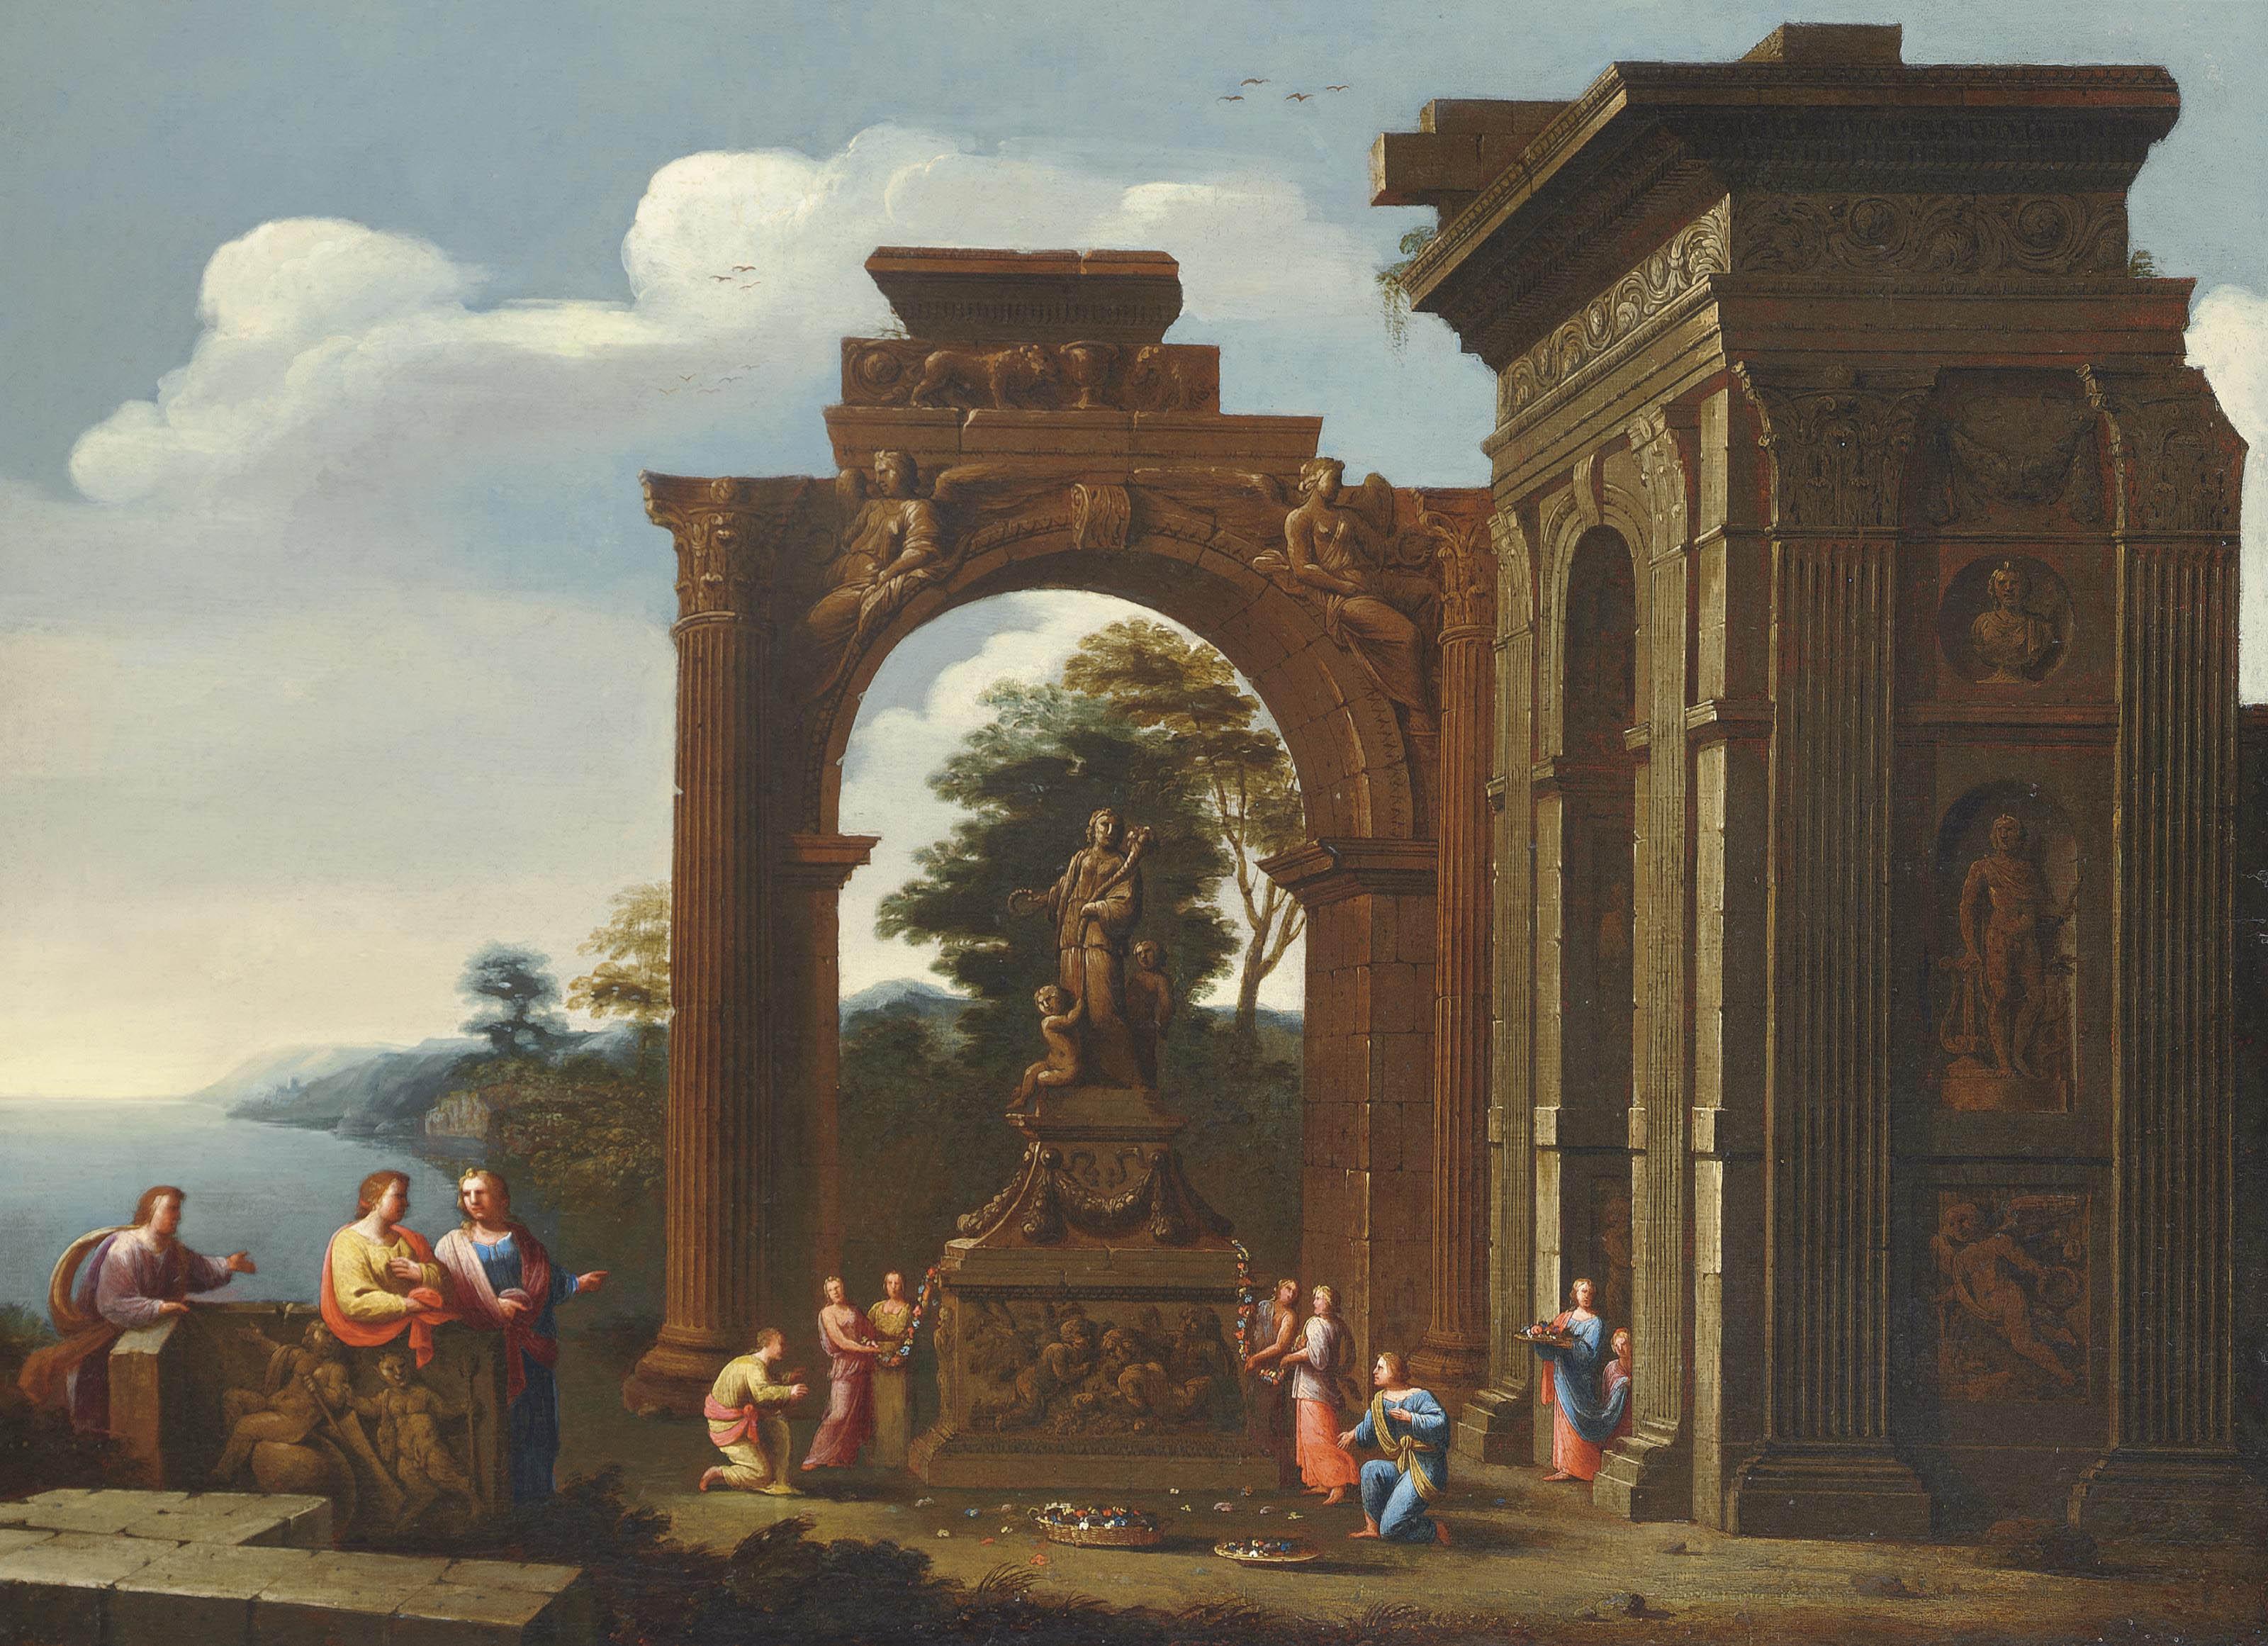 A capriccio of Roman ruins with classical figures adorning a shrine to Ceres